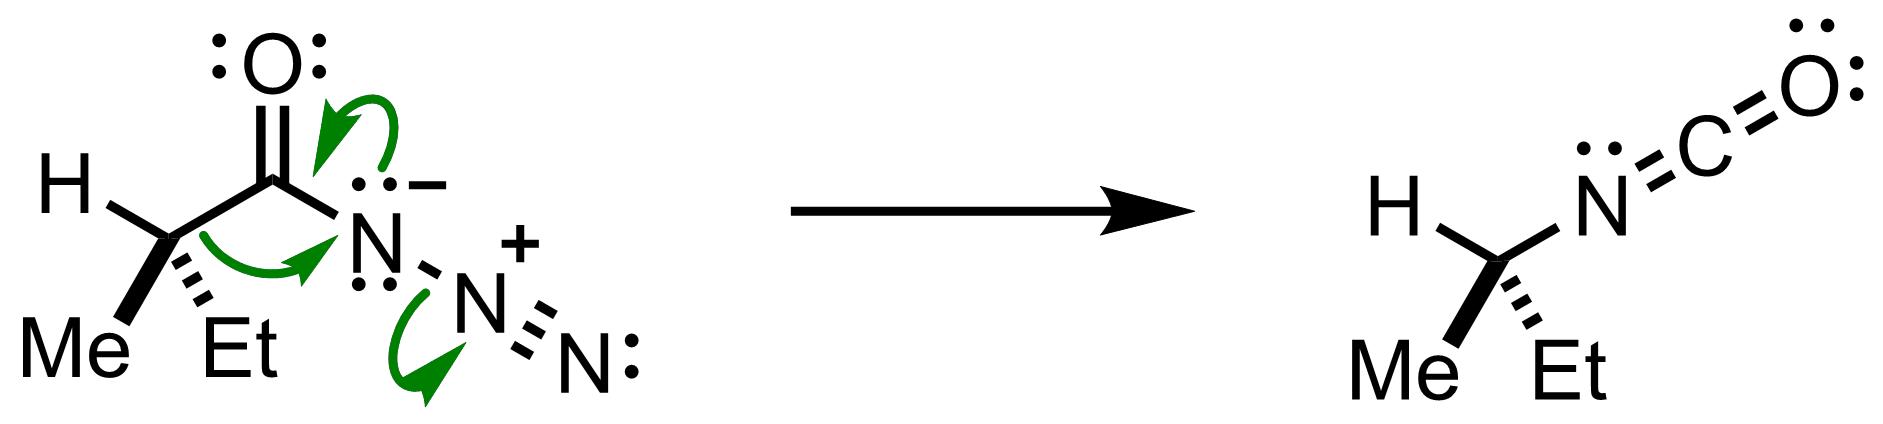 Mechanism of the Curtius Rearrangement